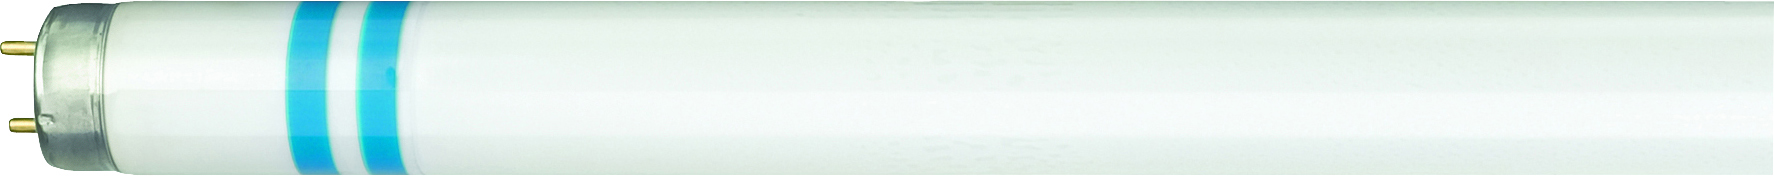 1 Stk TL-D Secura 58W/840 G13 Leuchtstoffröhre Neutralweiß LI82618540